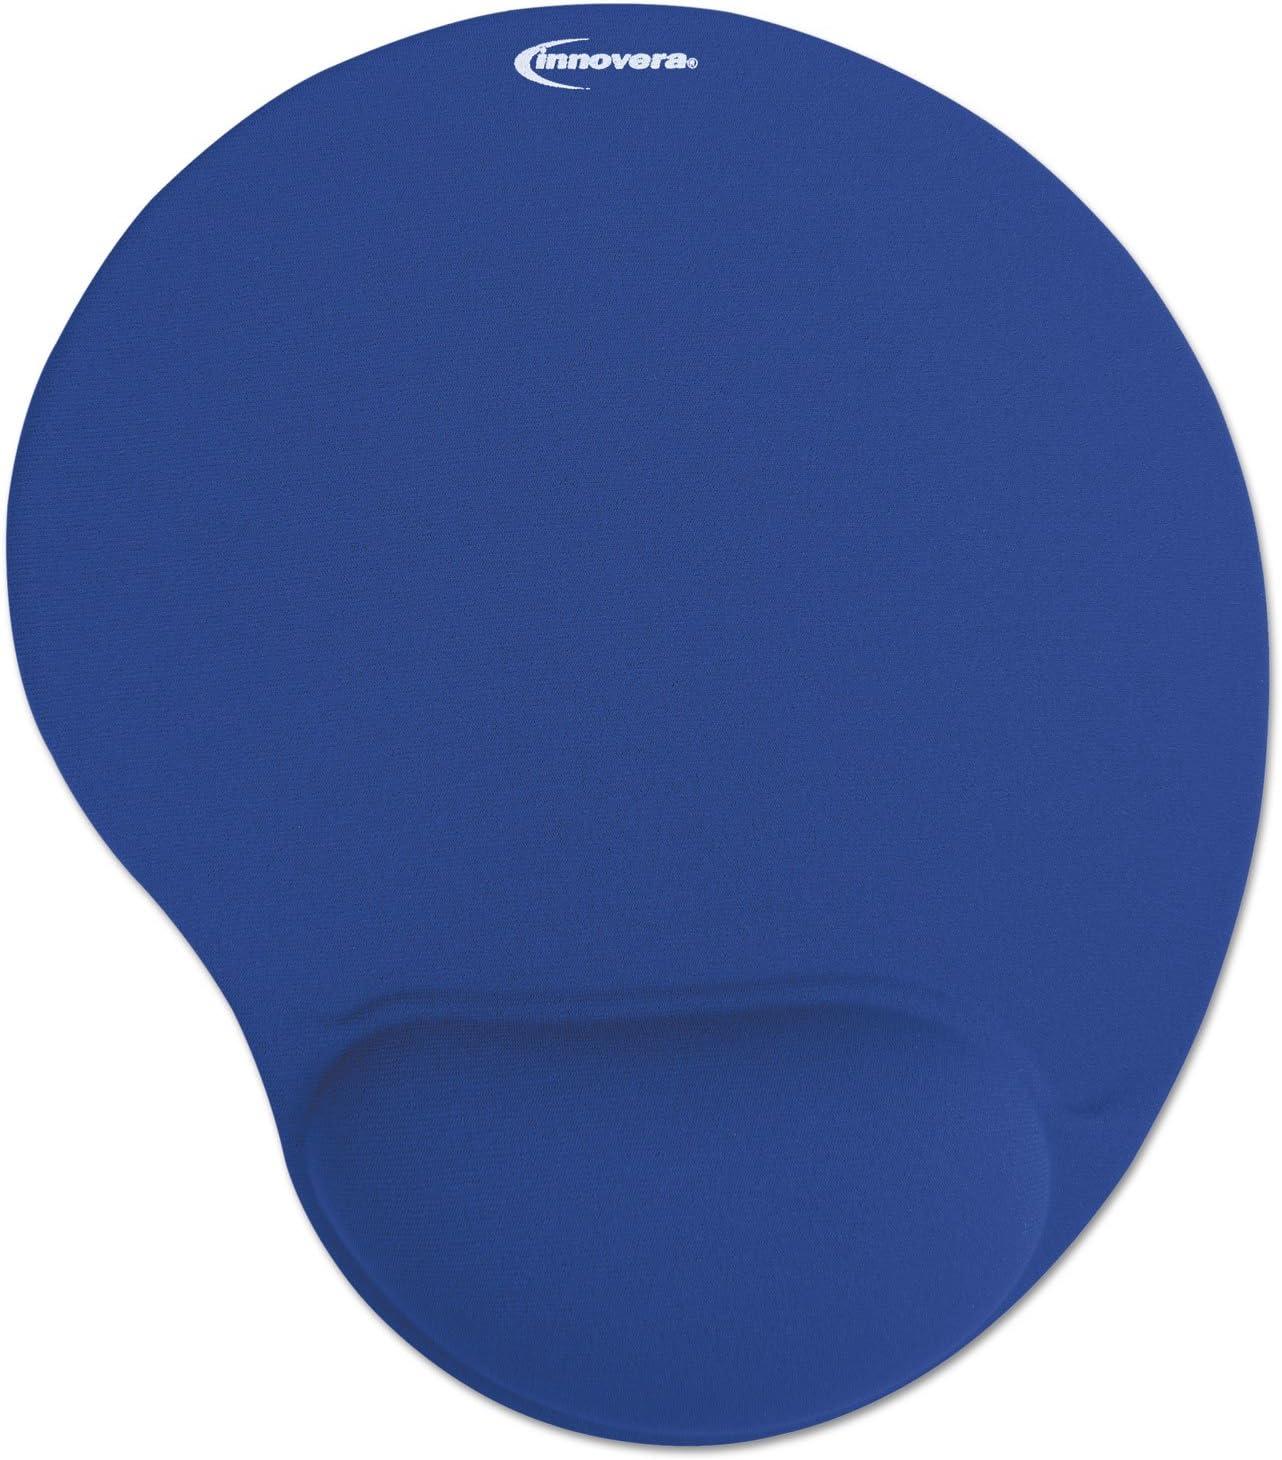 Innovera Mouse Pad w//Gel Wrist Pad Nonskid Base 10-3//8 x 8-7//8 Blue